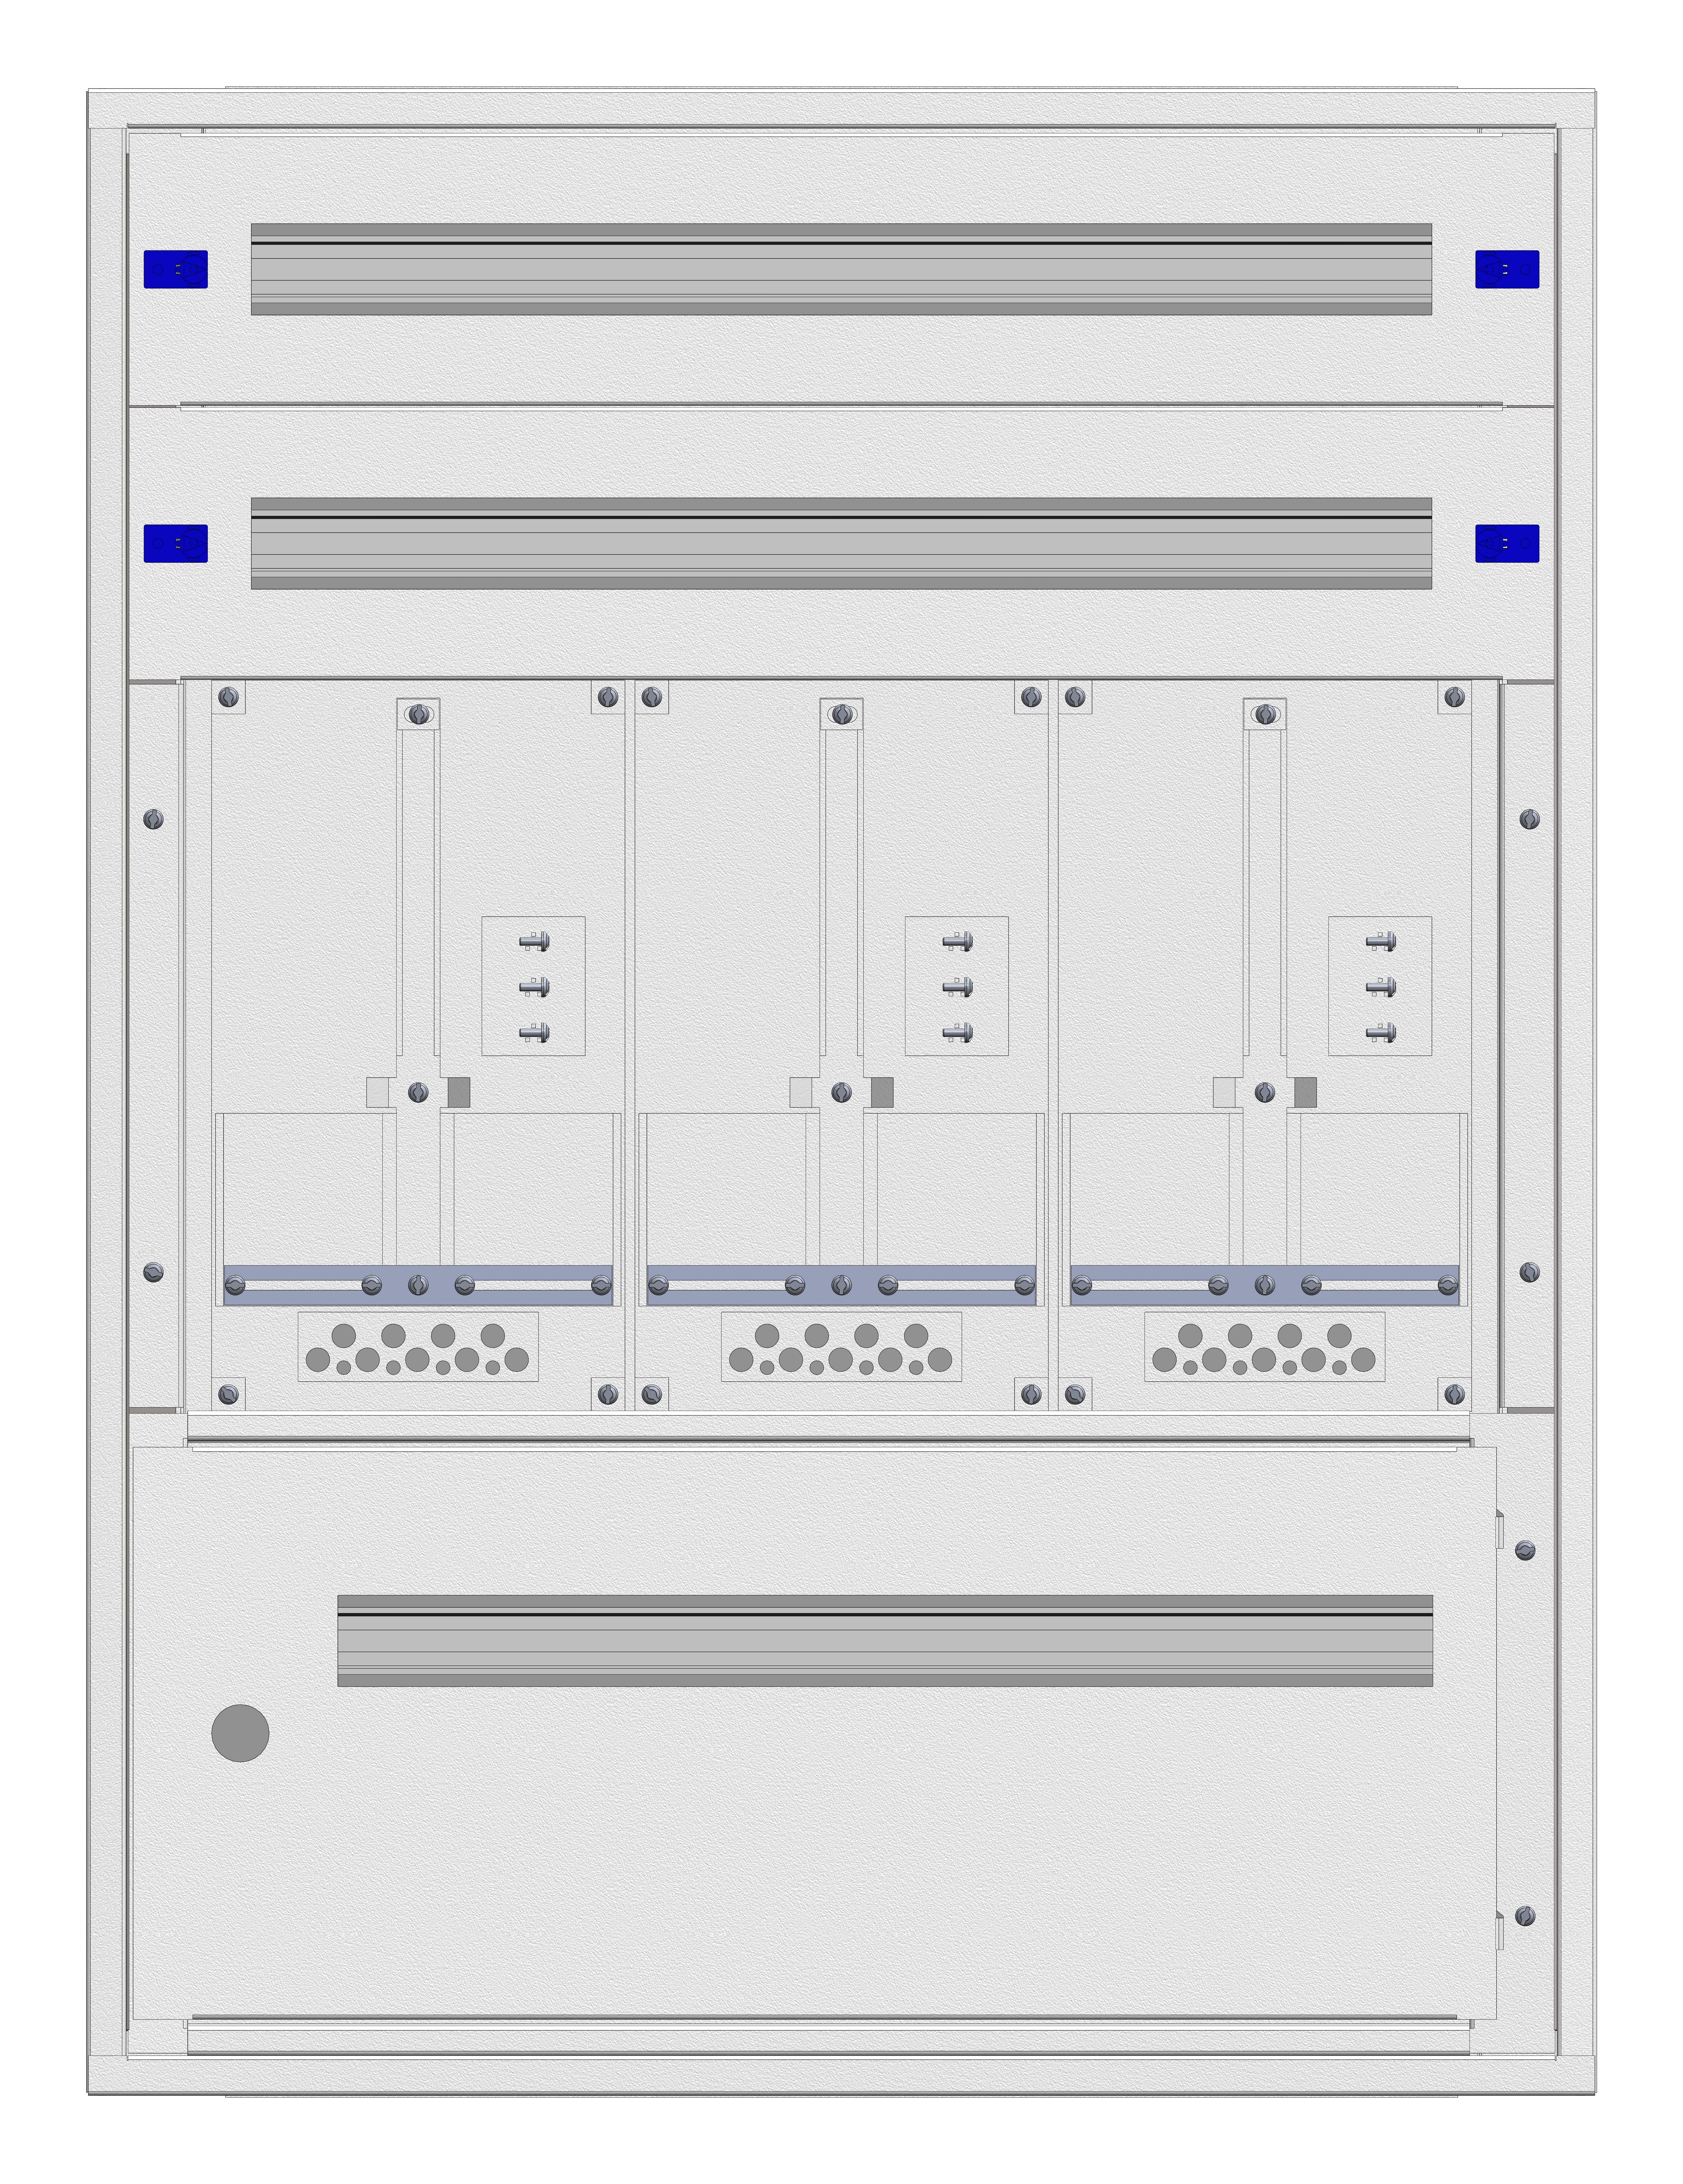 1 Stk Aufputz-Zählerverteiler 3A-21E/STMK 3ZP, H1055B810T250mm IL160321GS